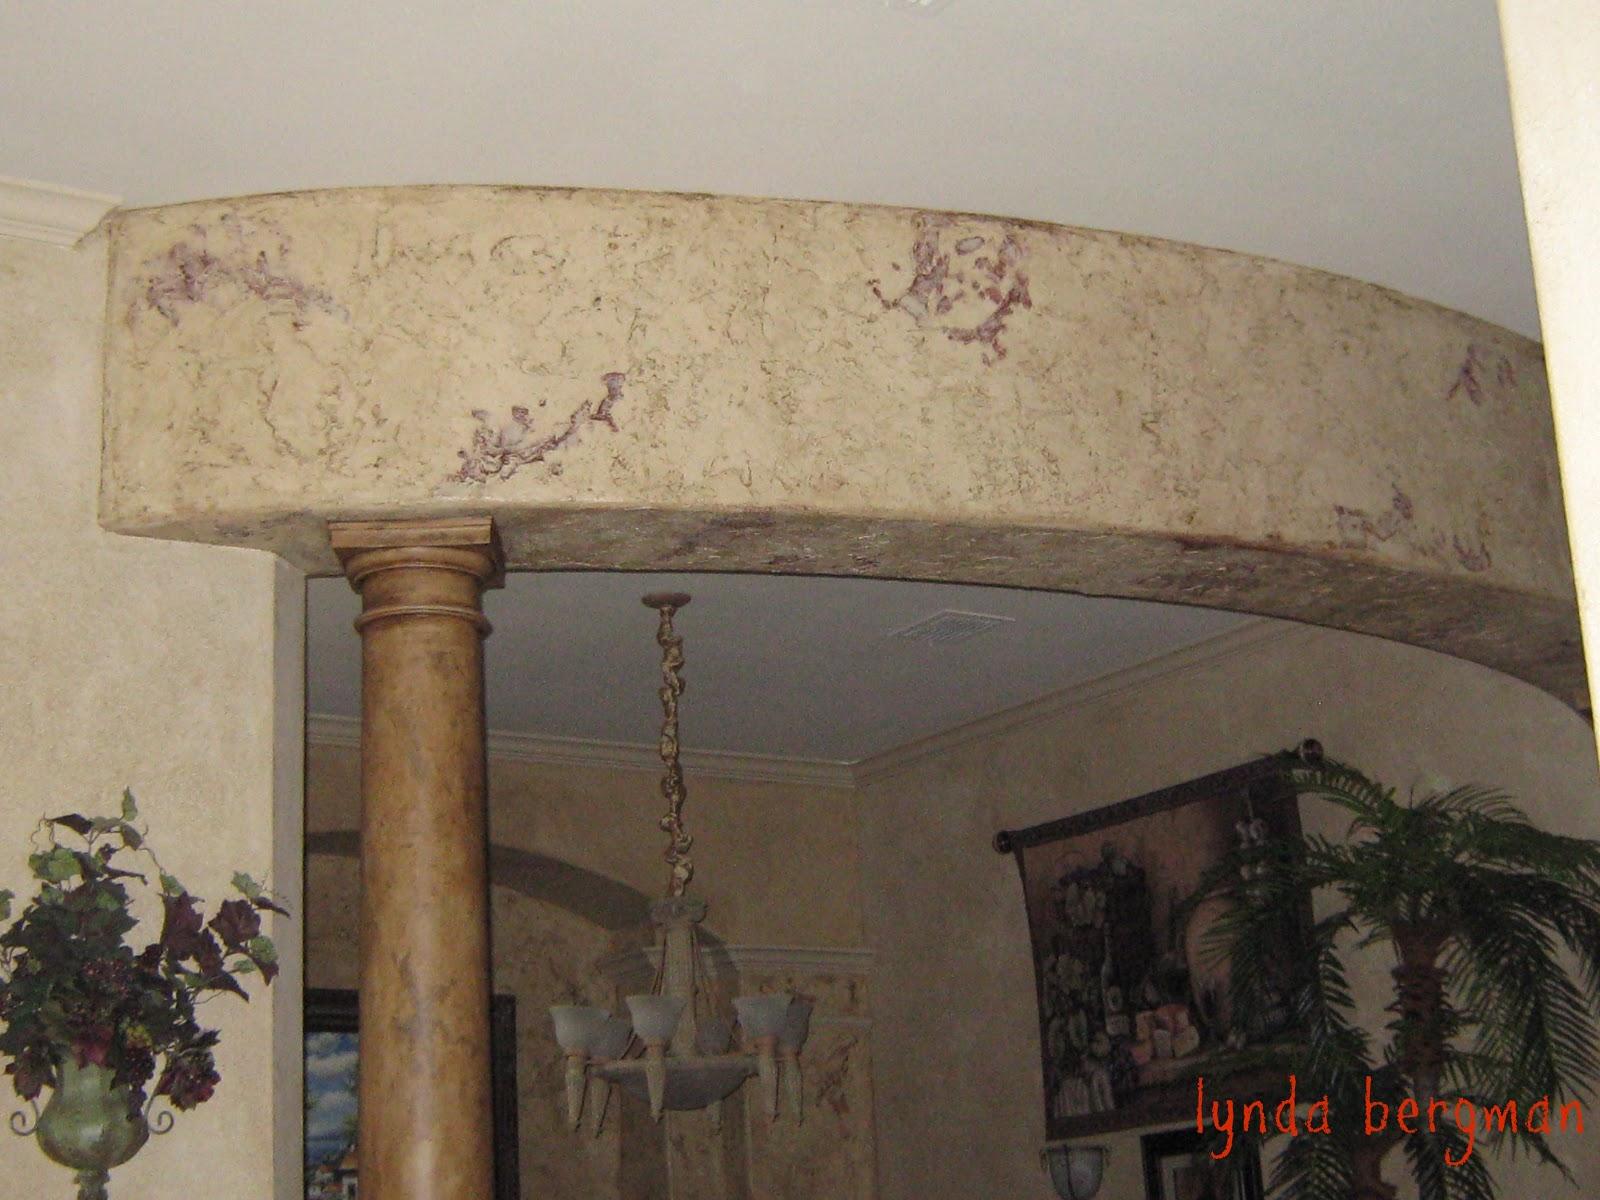 Lynda bergman decorative artisan painting columns mantel from painting columns mantel from white to look like wood old distressed amipublicfo Gallery